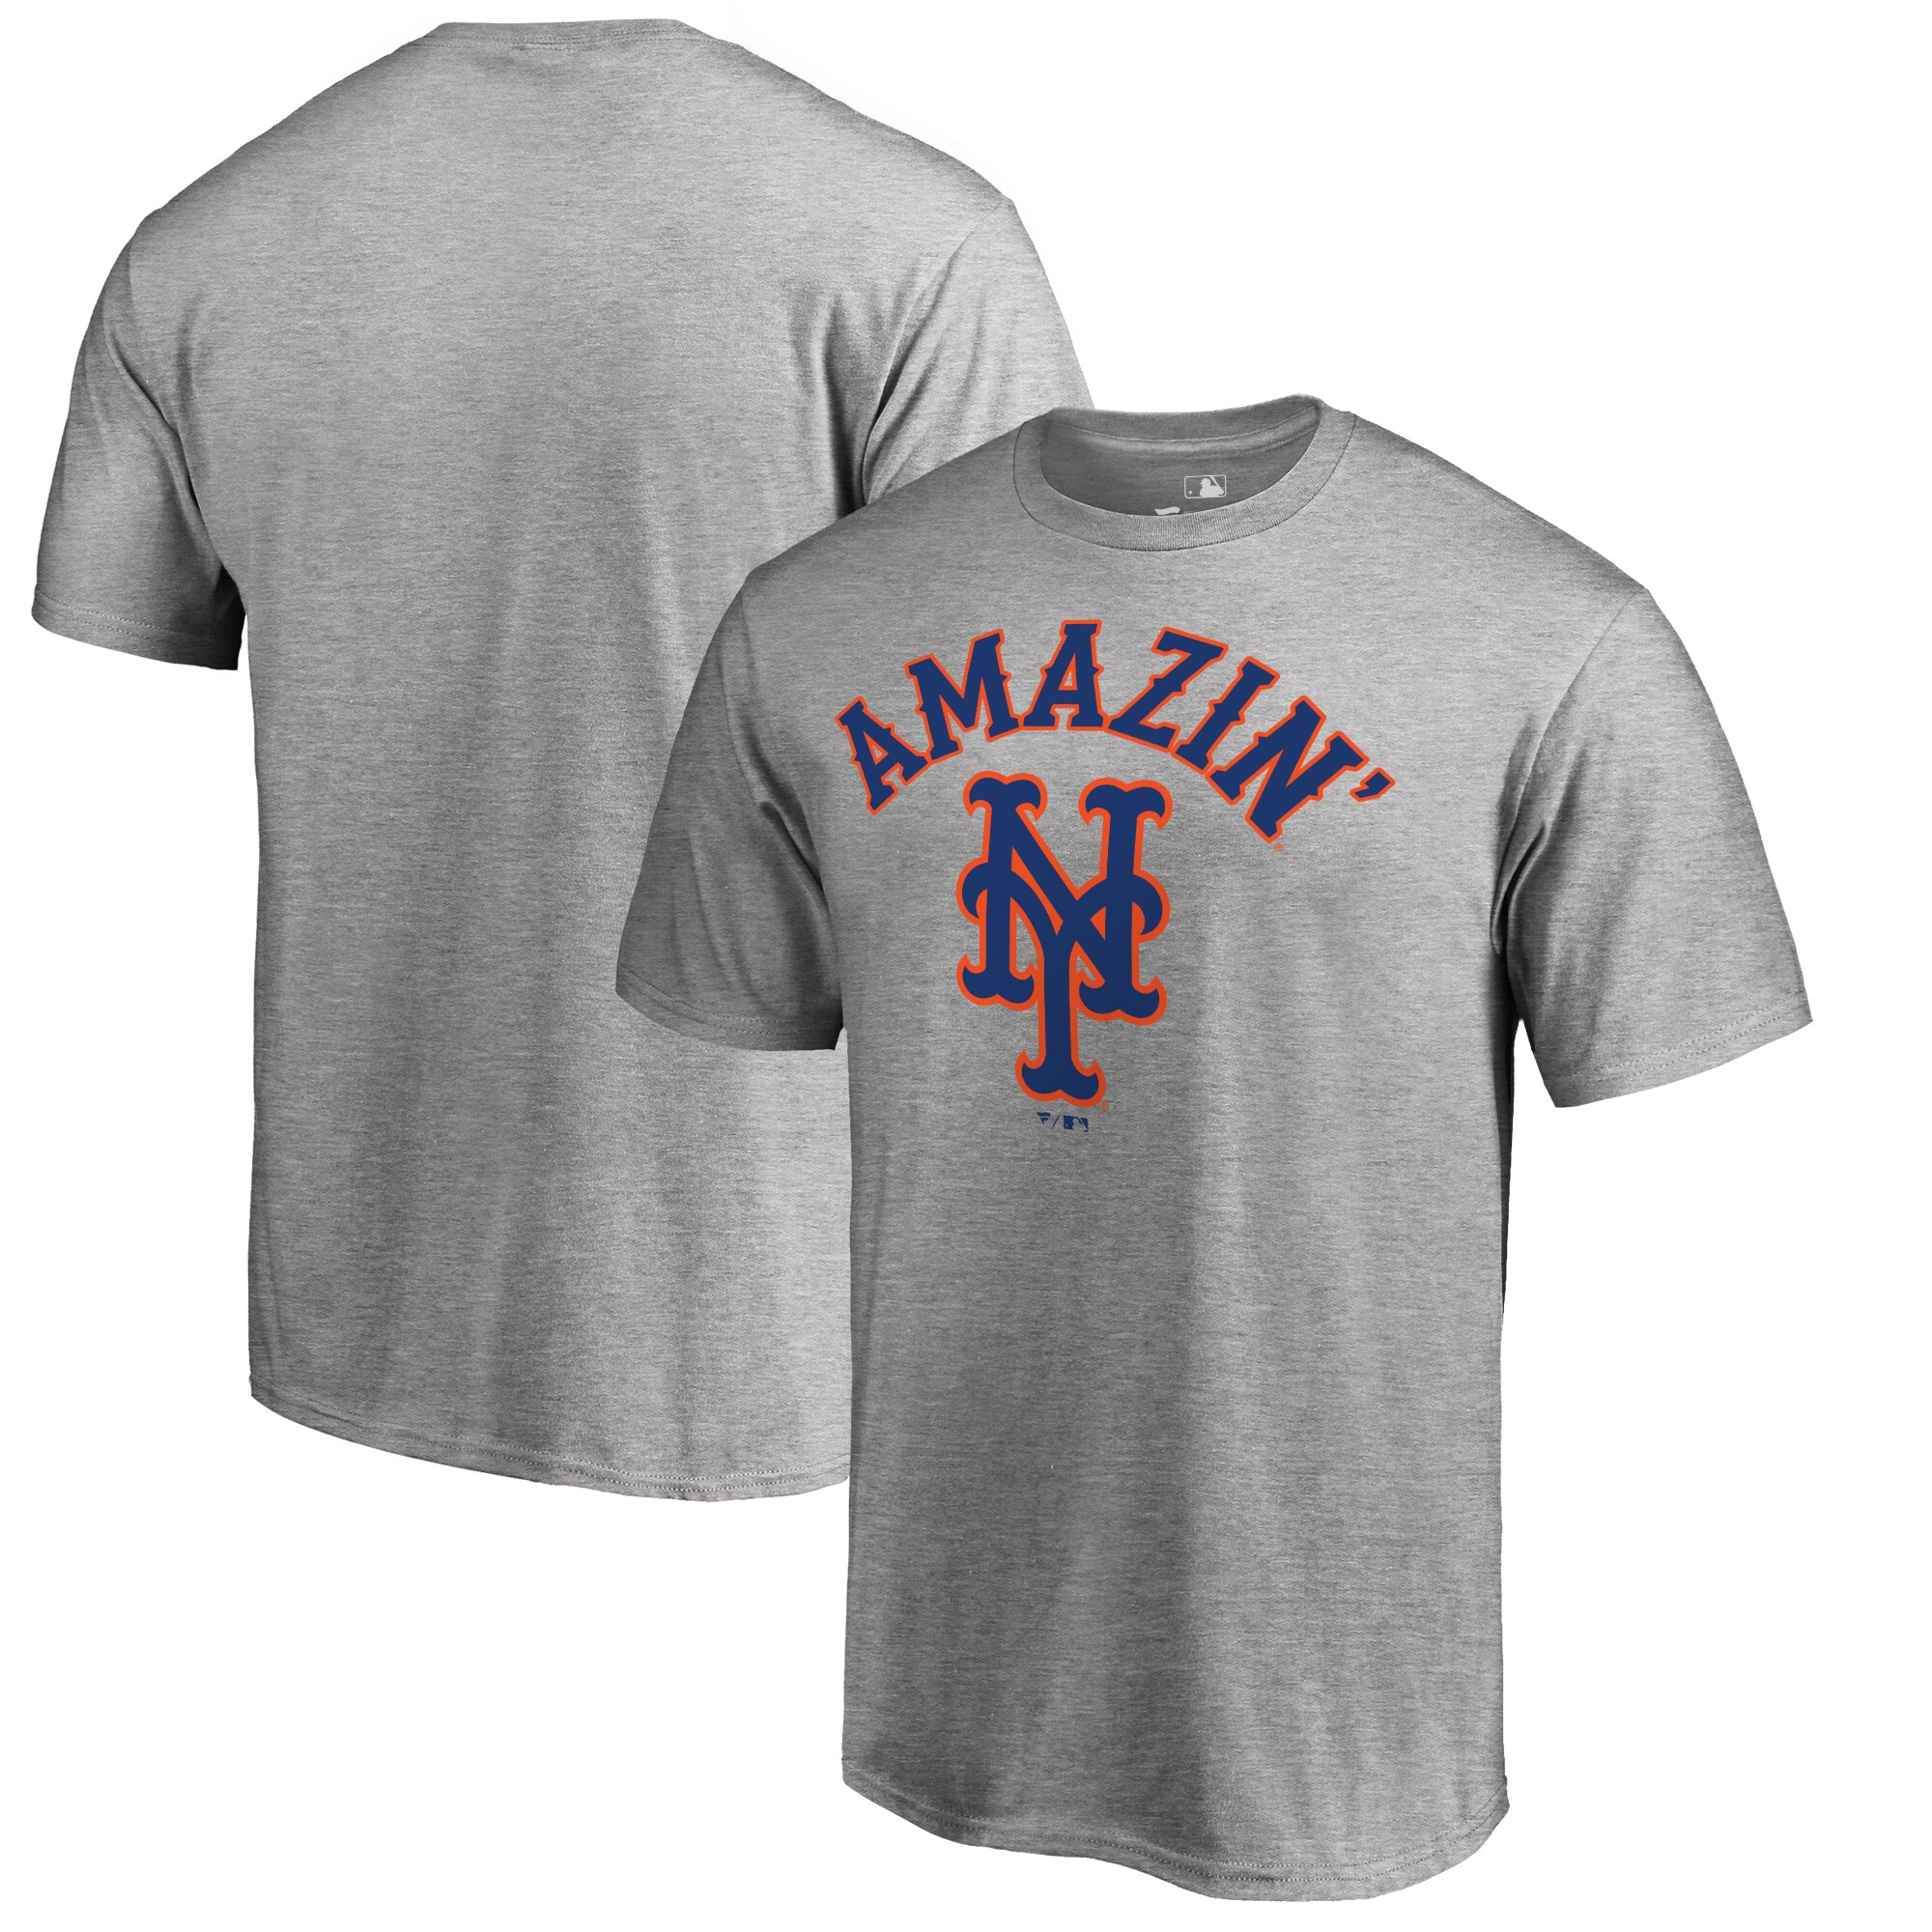 New York Mets Amazin Hometown T-Shirt - Ash